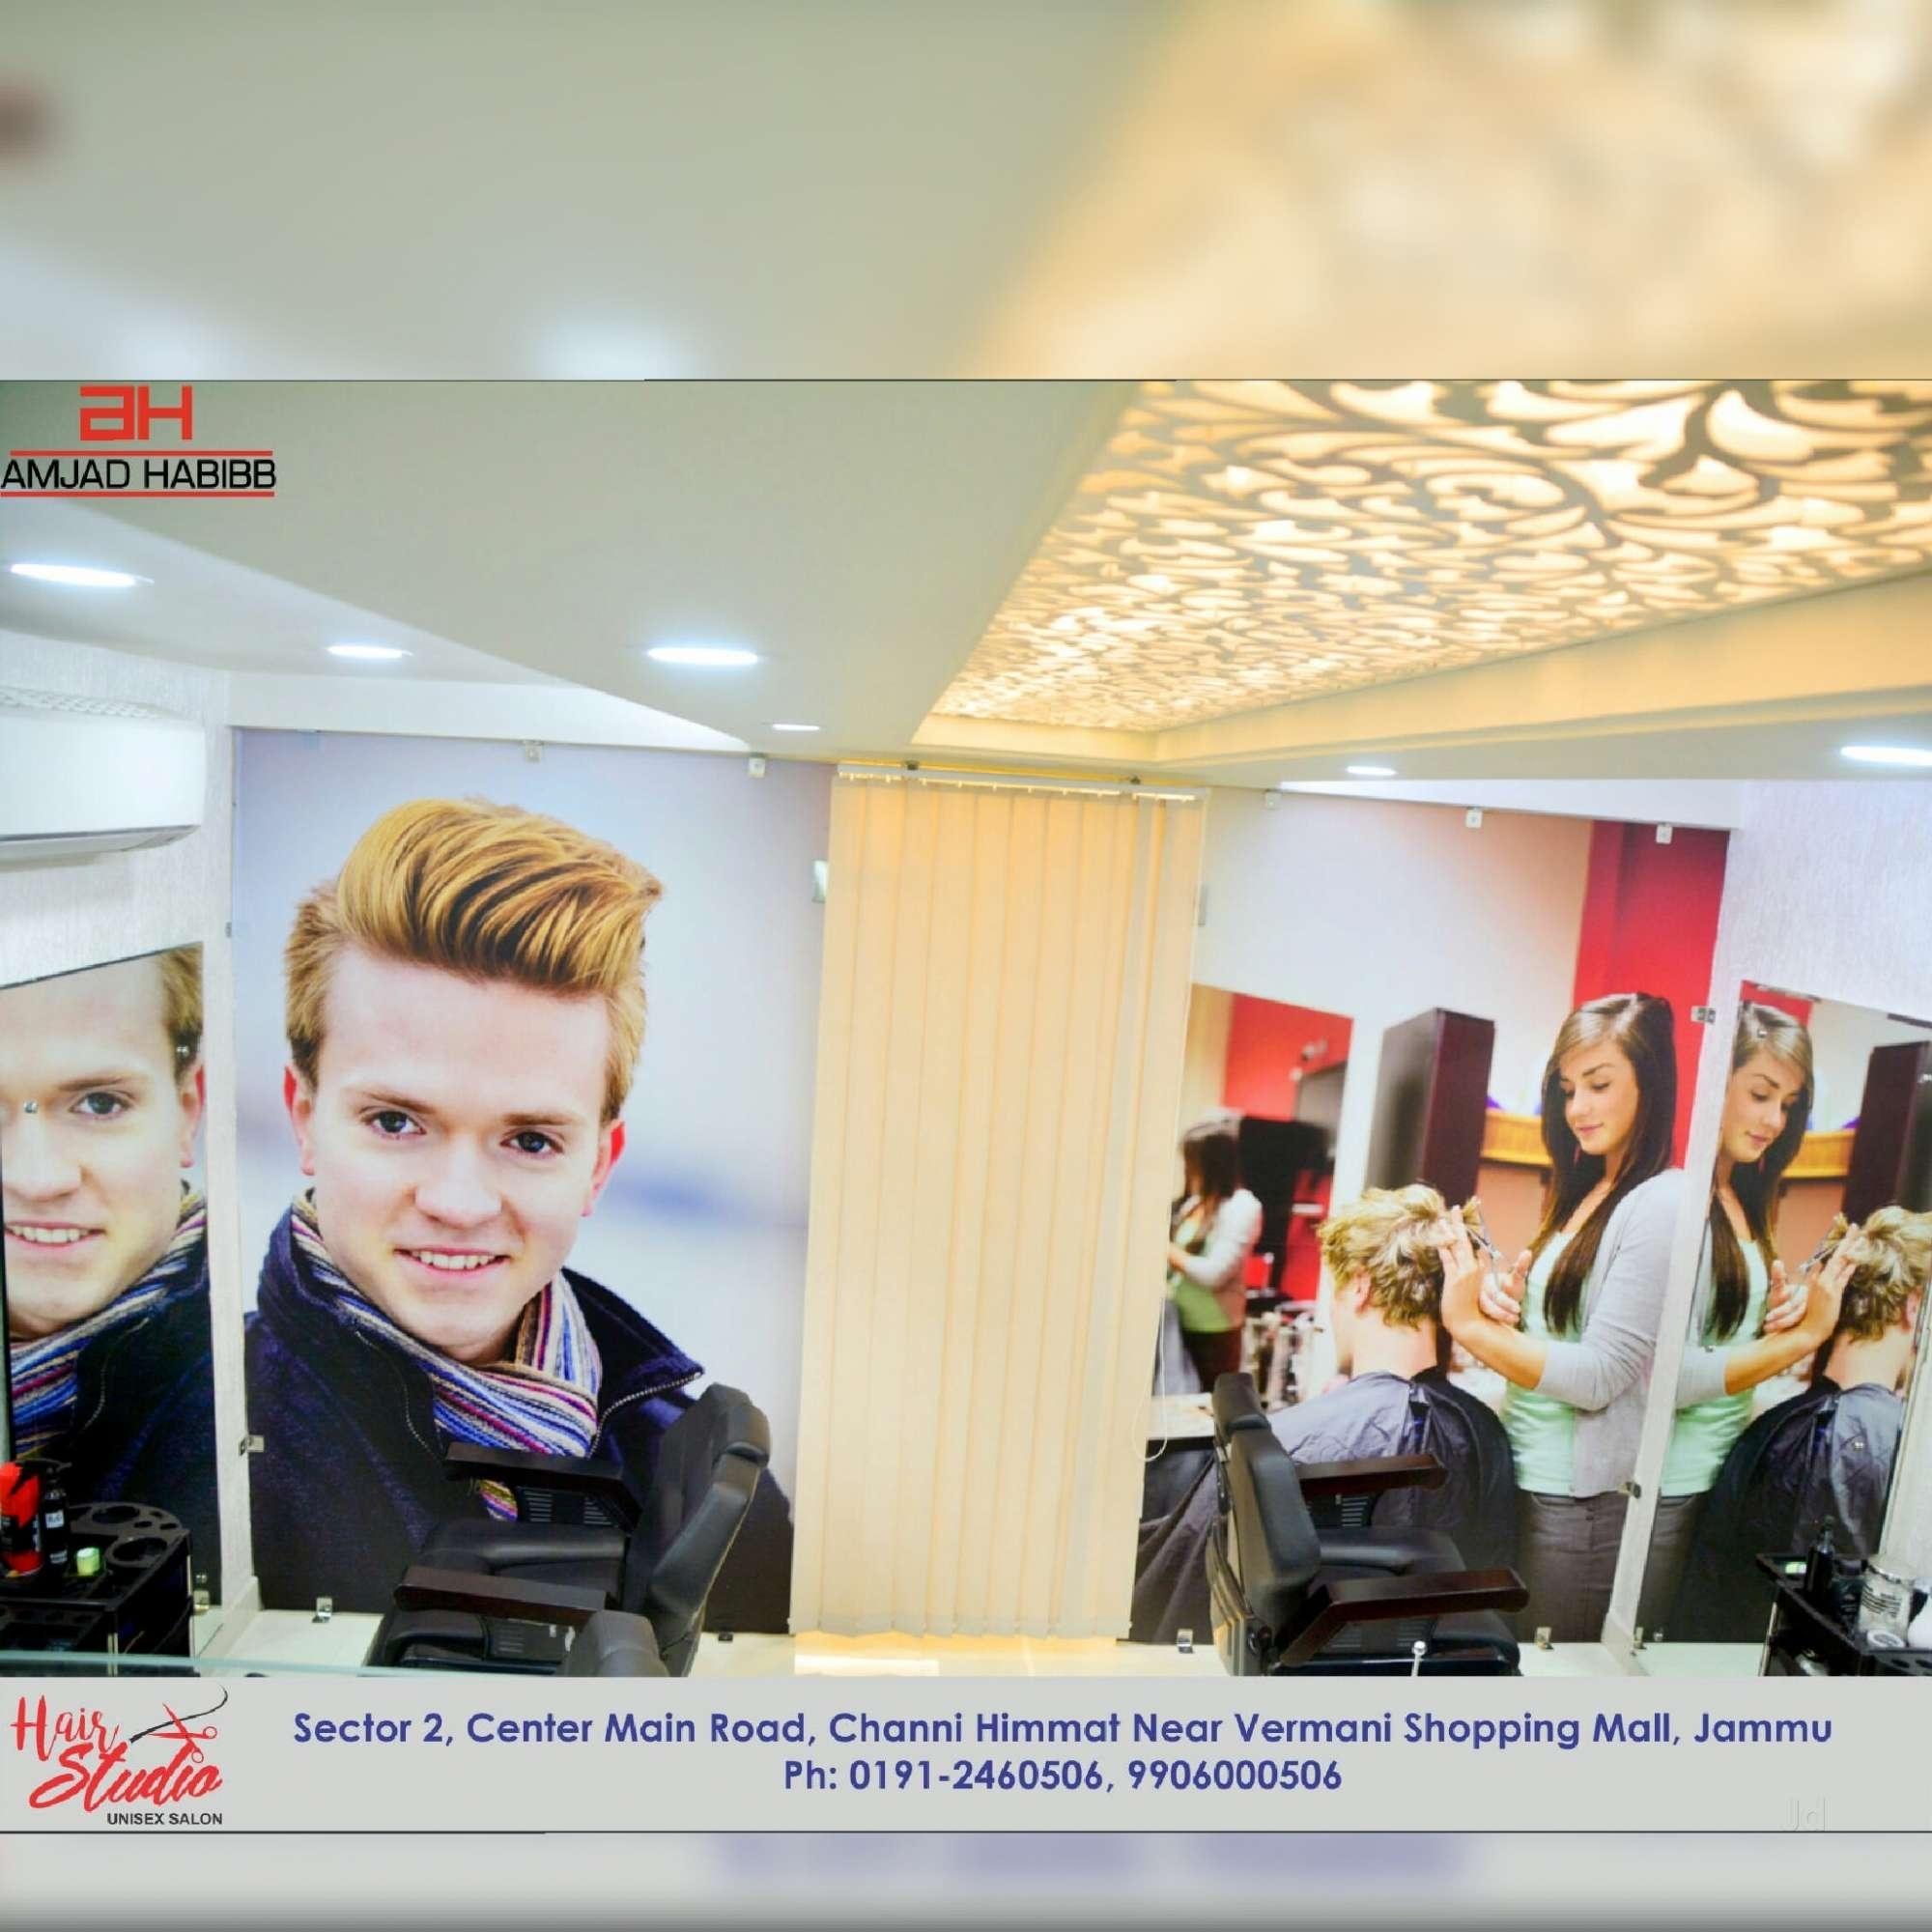 Amjad Habibb Hair Studio Unisex Salon, Chani Himat - Salons In Jammu in Best Haircut Salon In Jammu